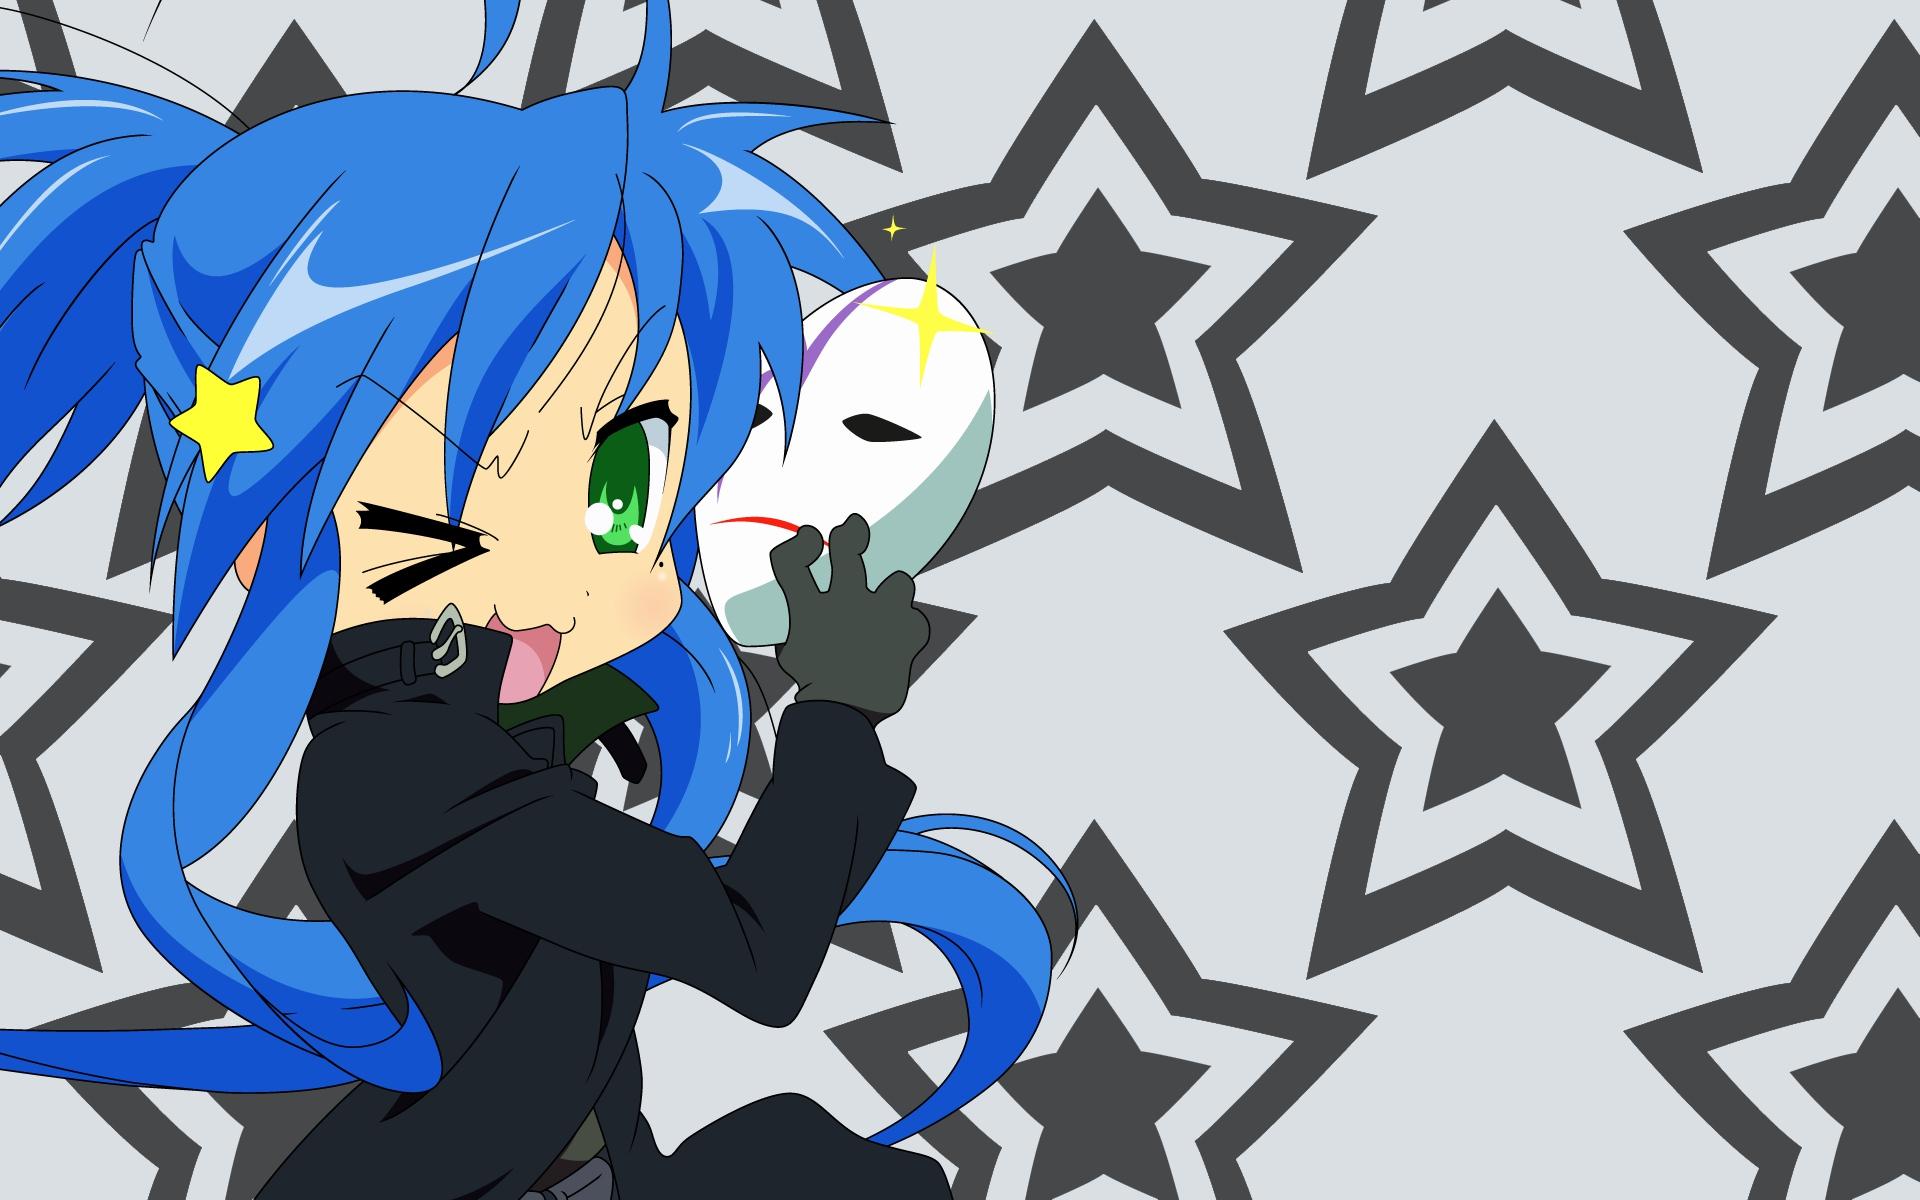 cosplay darker_than_black izumi_konata lucky_star mask parody stars vector